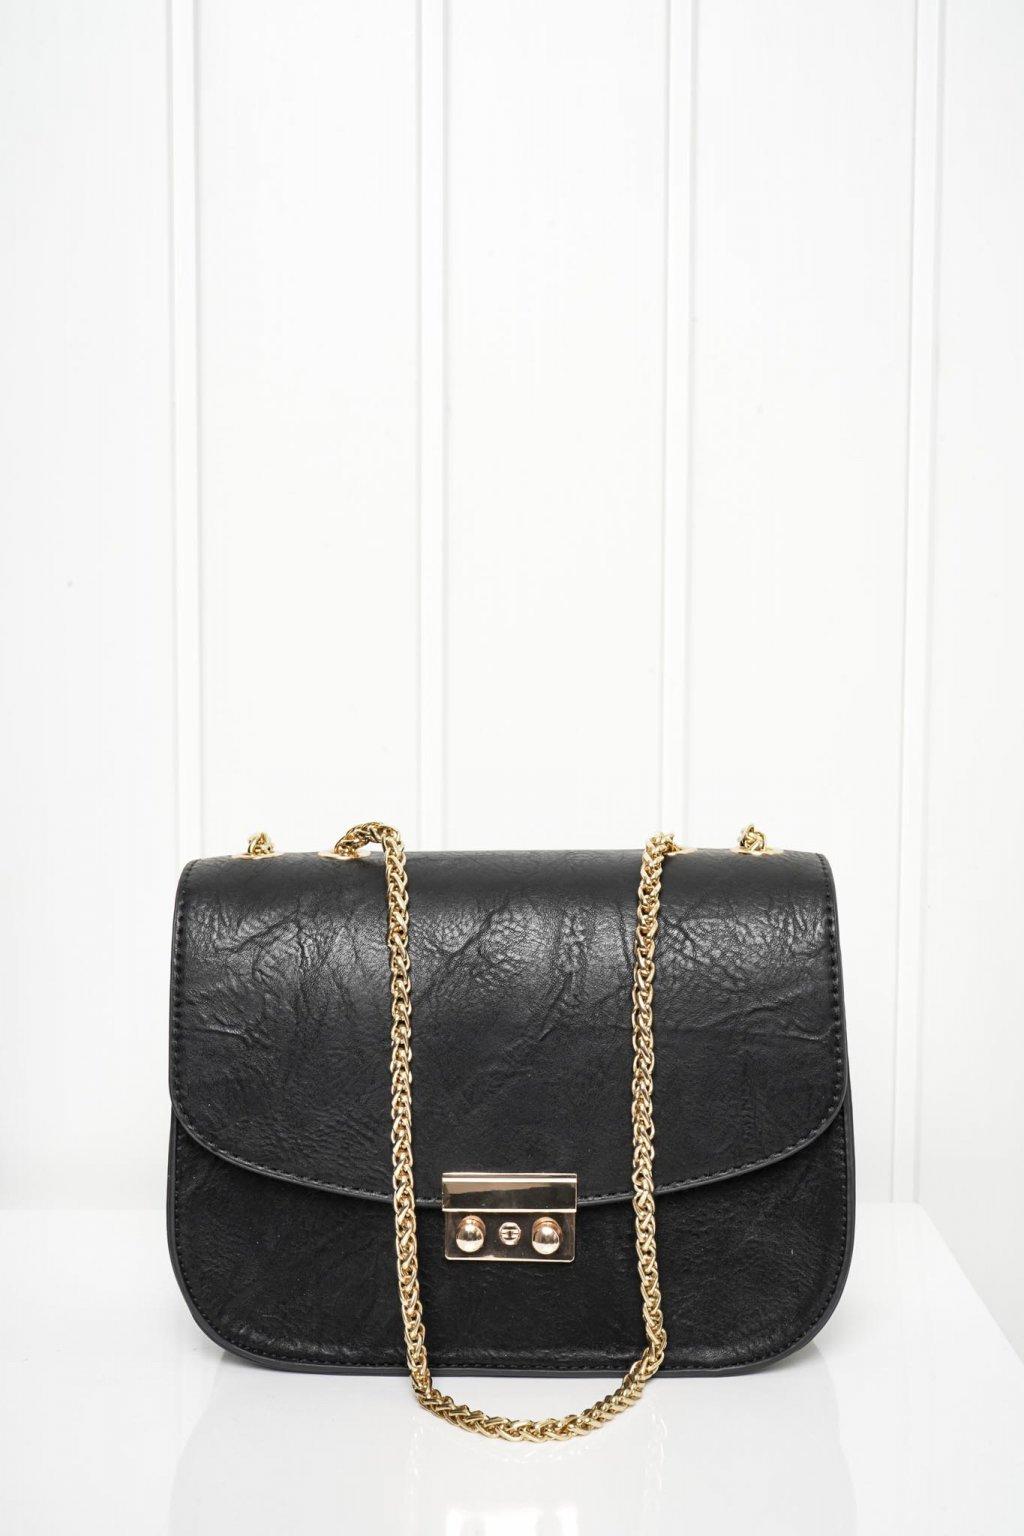 Kabelka, crossbody, ruksak, shopping bag, shopperka, 294